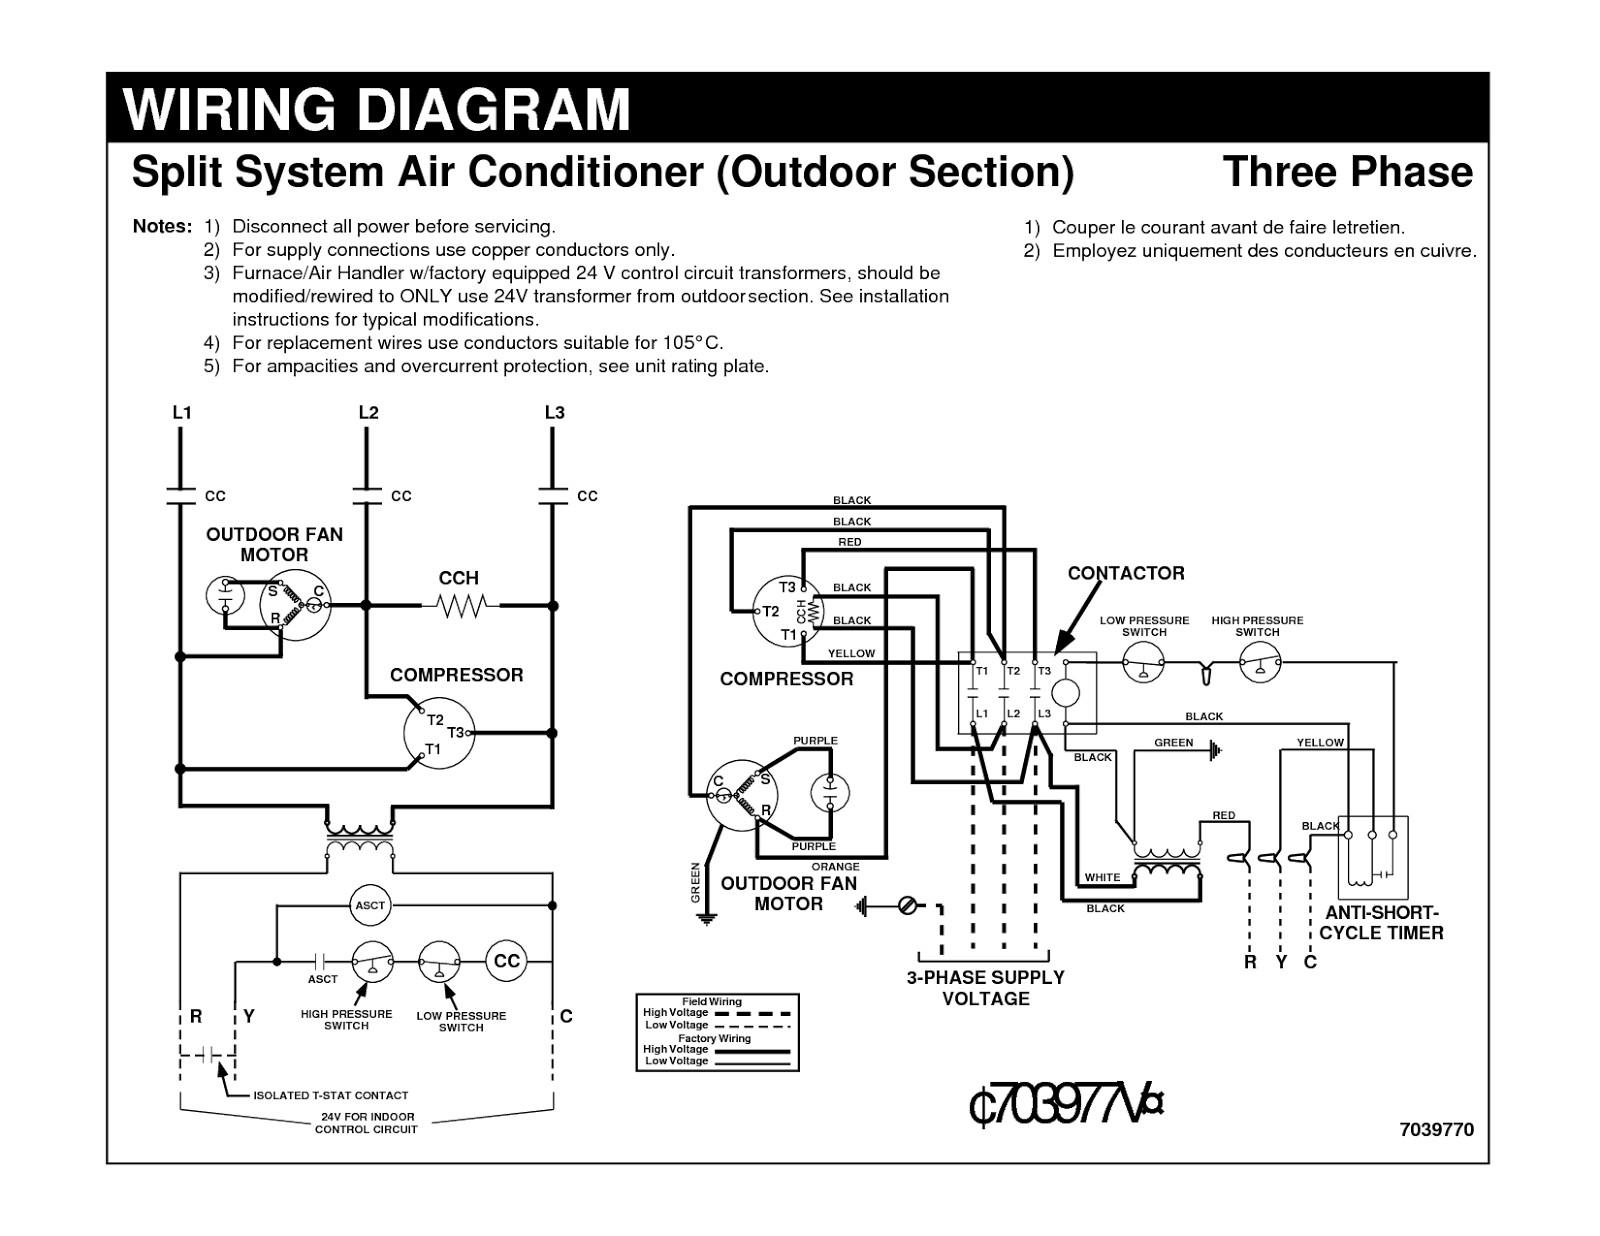 Air Conditioner Wiring Diagram Wiring Diagrams Lg Air Conditioner Remote Control Manual Ac Of Air Conditioner Wiring Diagram